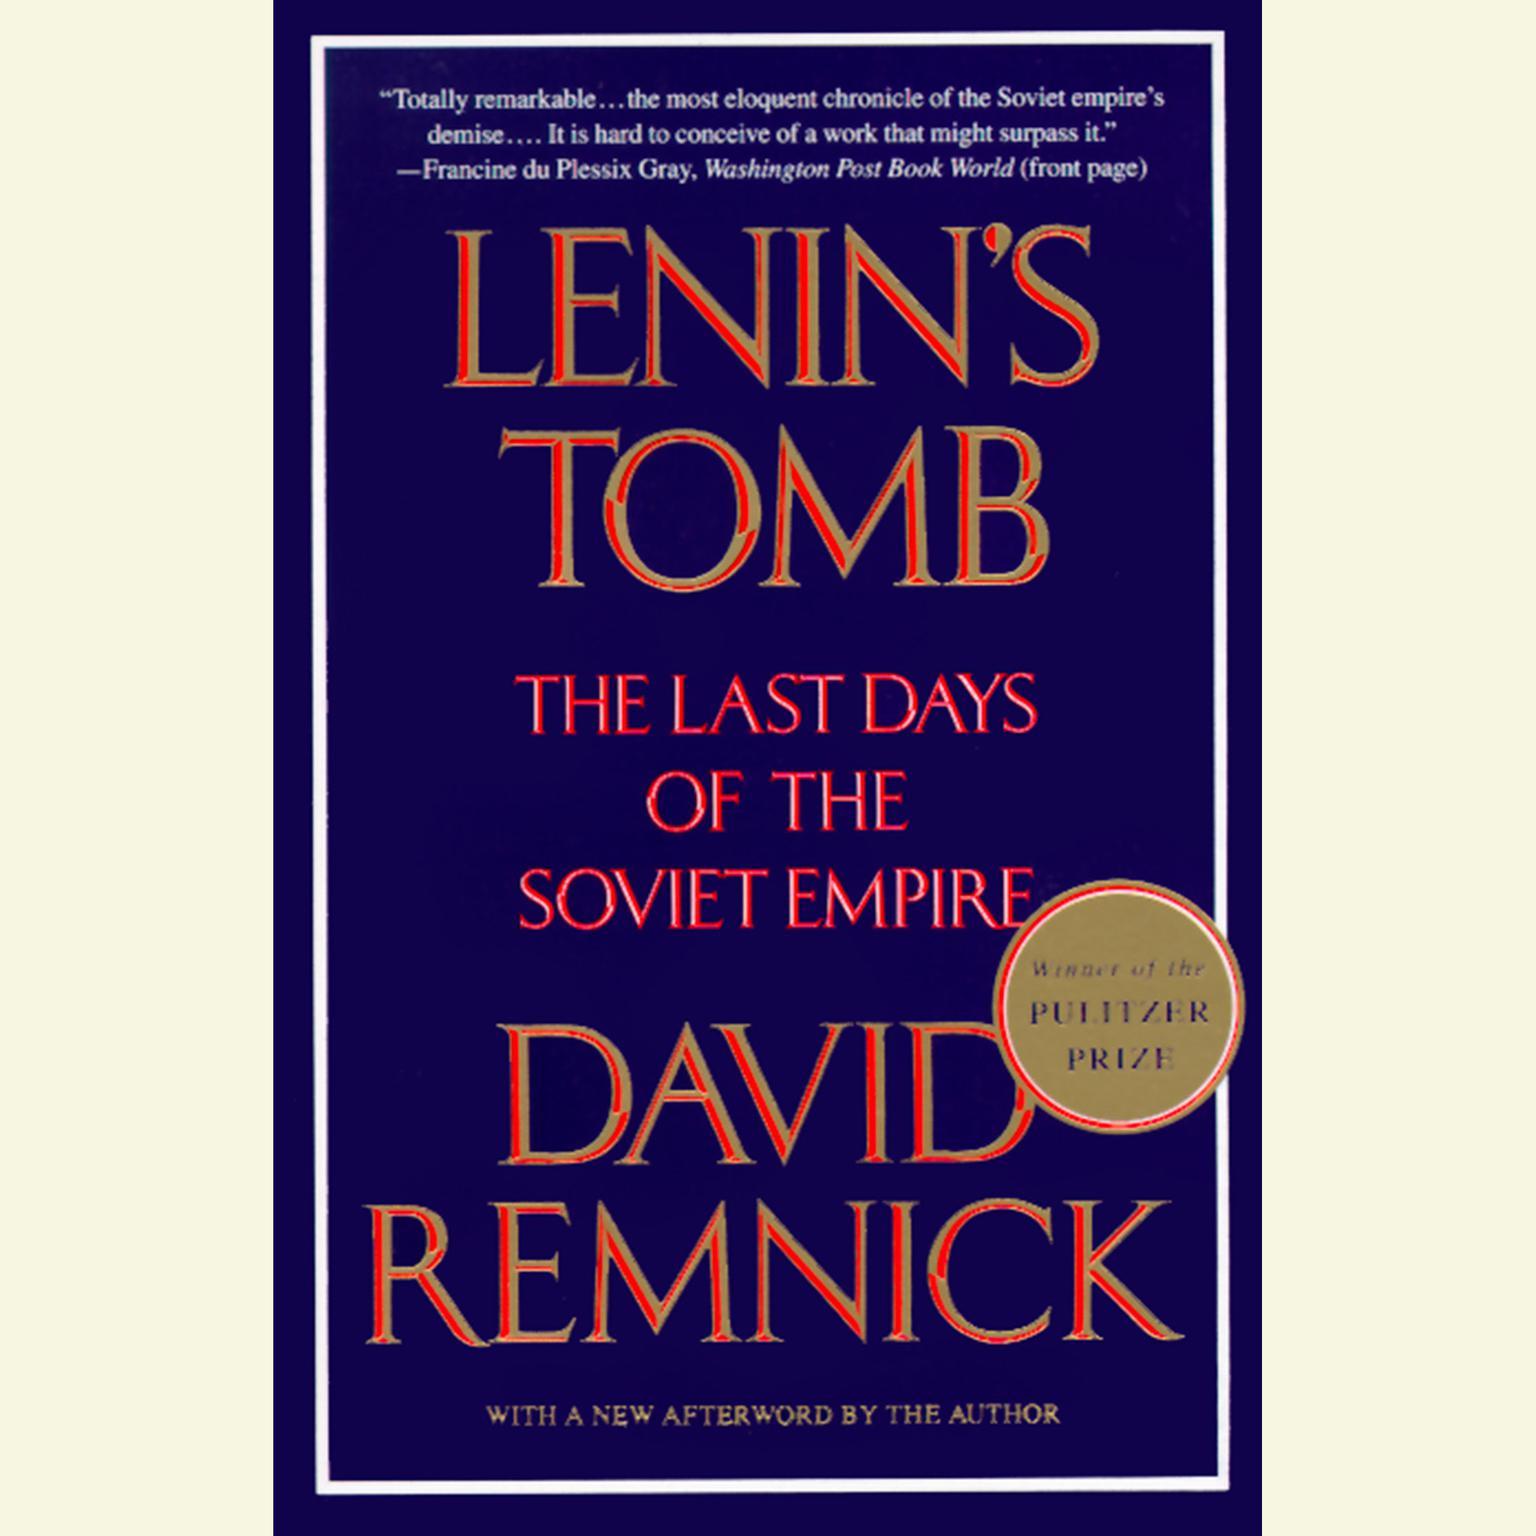 Printable Lenin's Tomb: The Last Days Of The Soviet Empire Audiobook Cover Art